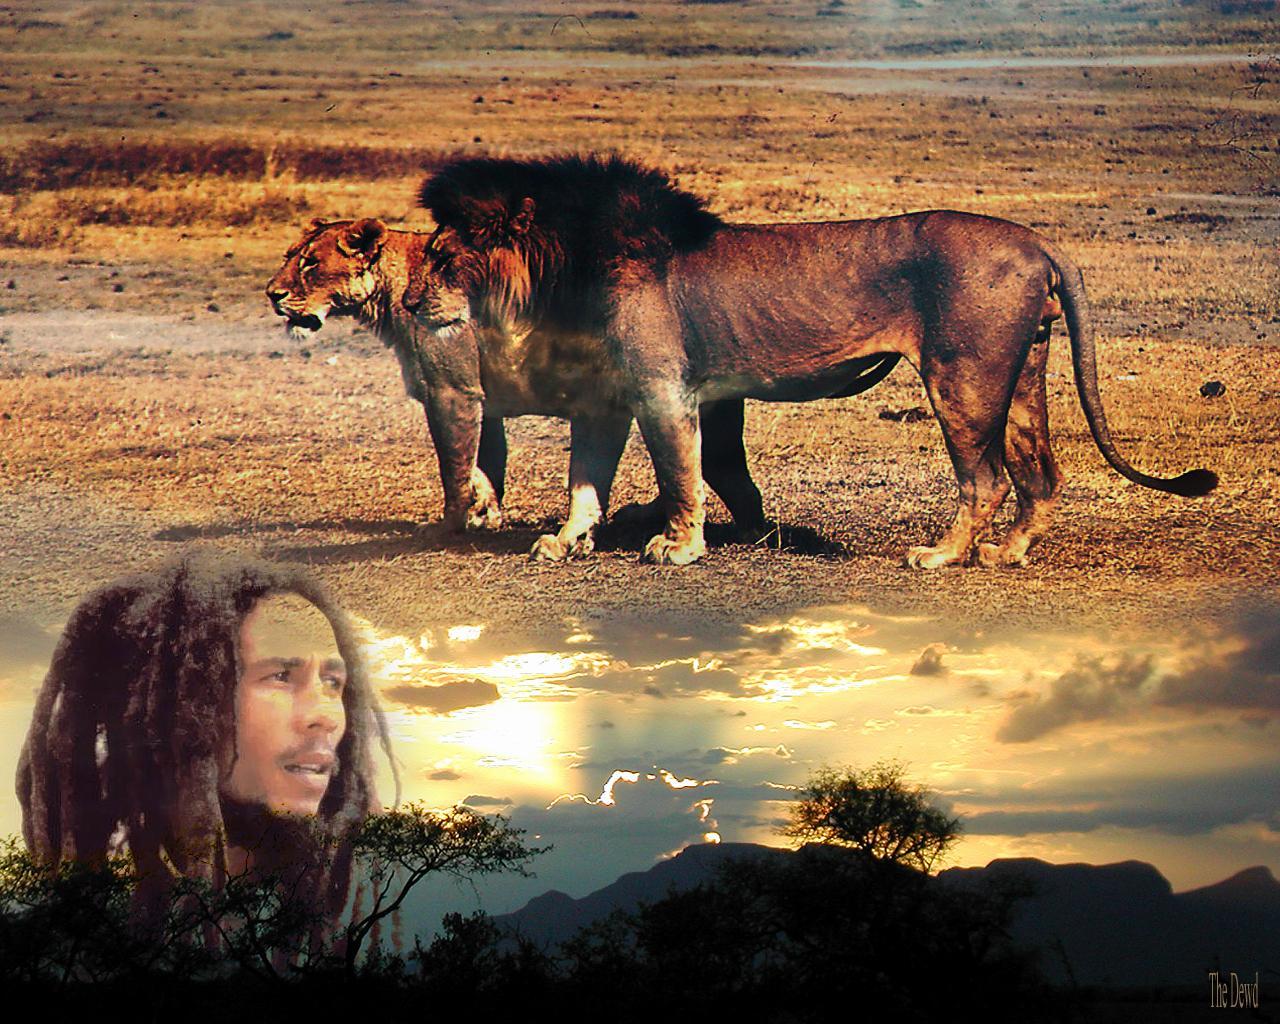 http://4.bp.blogspot.com/_NfL3G9J_JlA/TJ840zpXqPI/AAAAAAAAAF8/fmBT8PuMBGY/s1600/Bob_Marley-lion-judah-god.jpg